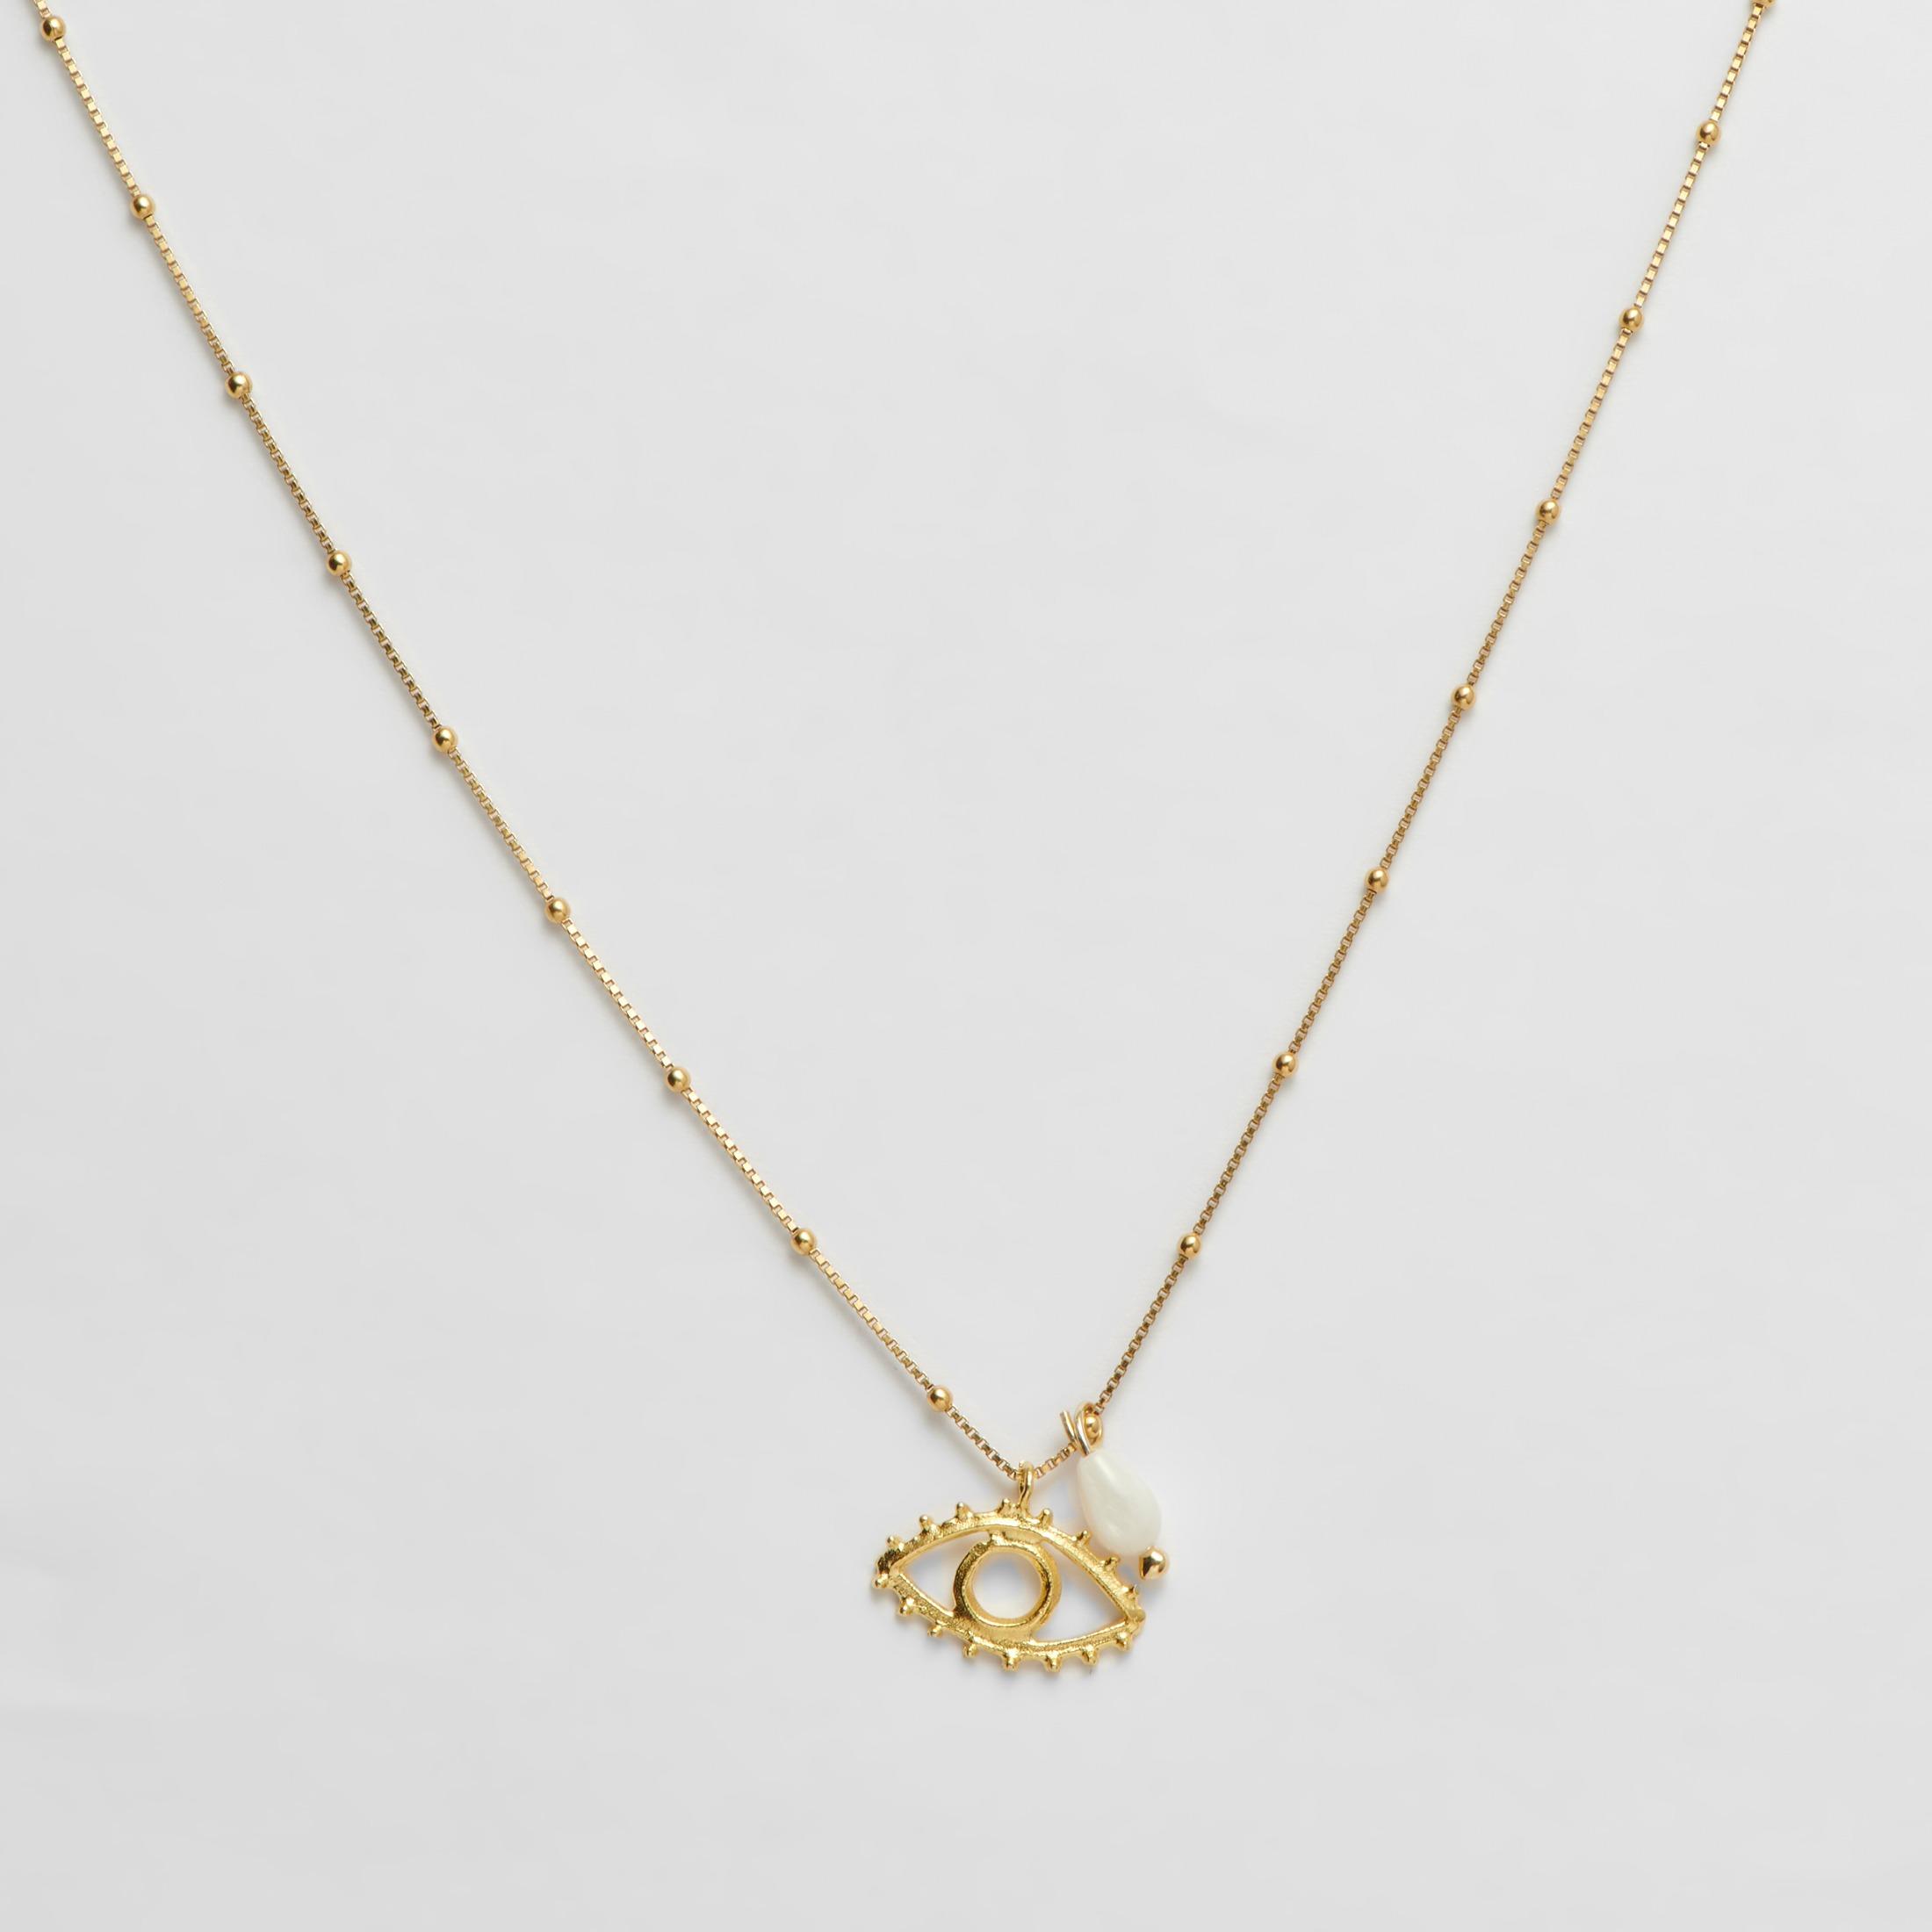 200-57-PL Evil eye necklace κολιέ χρυσό